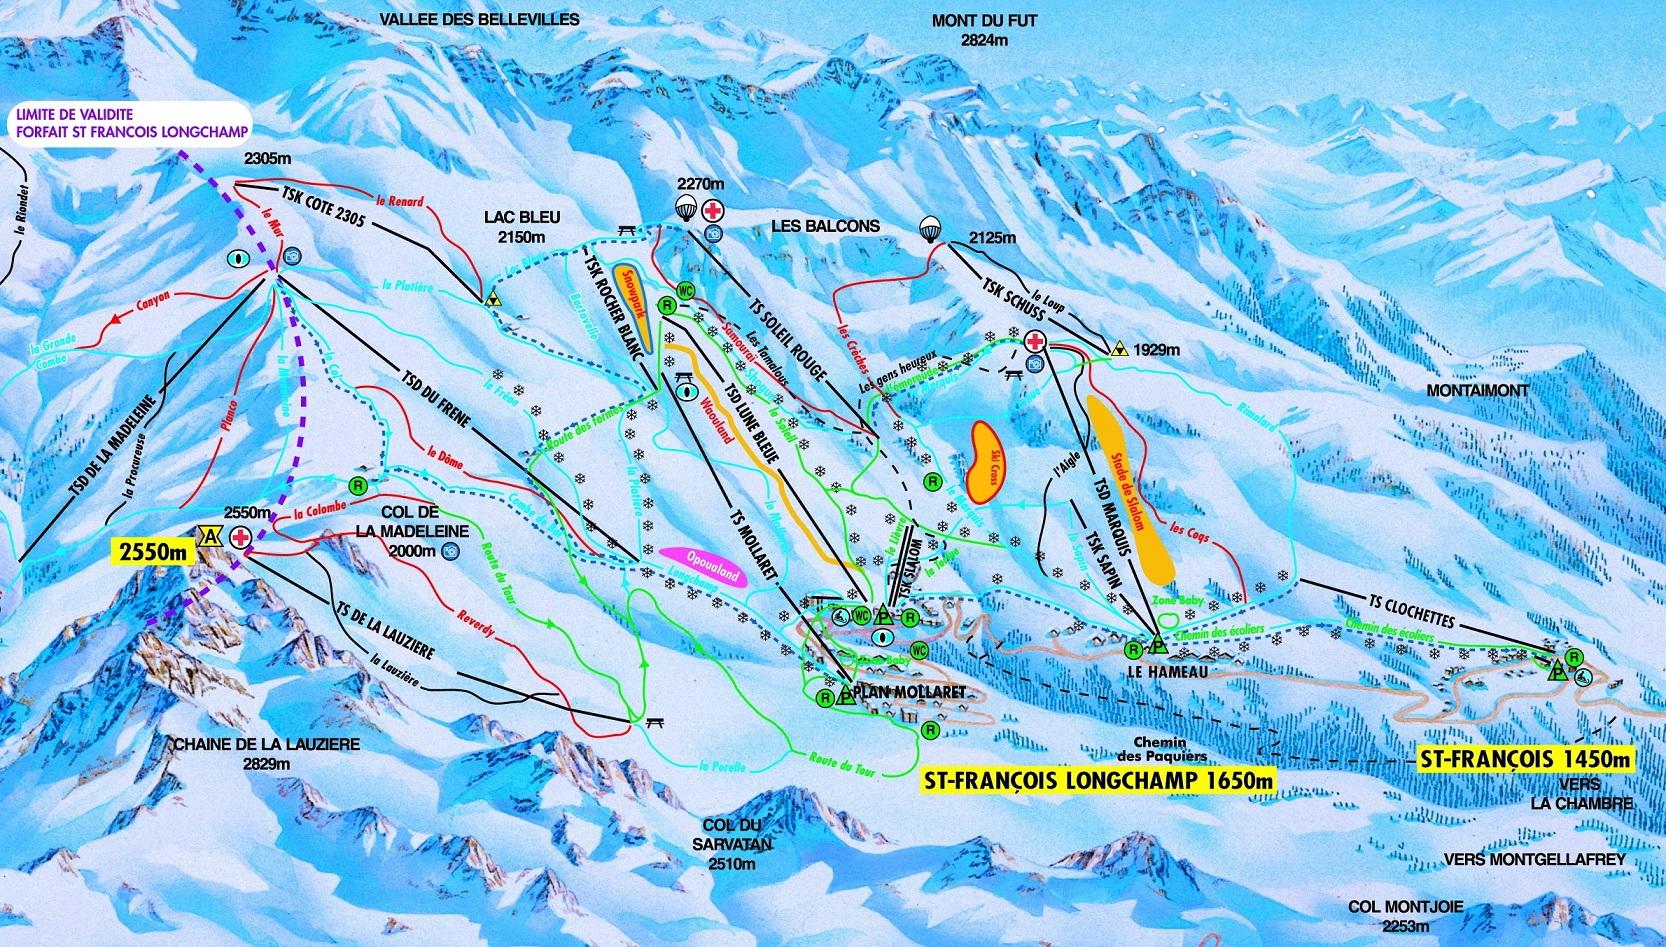 St.Francois-Longchamp ski resort airport transfers | Alps2Alps